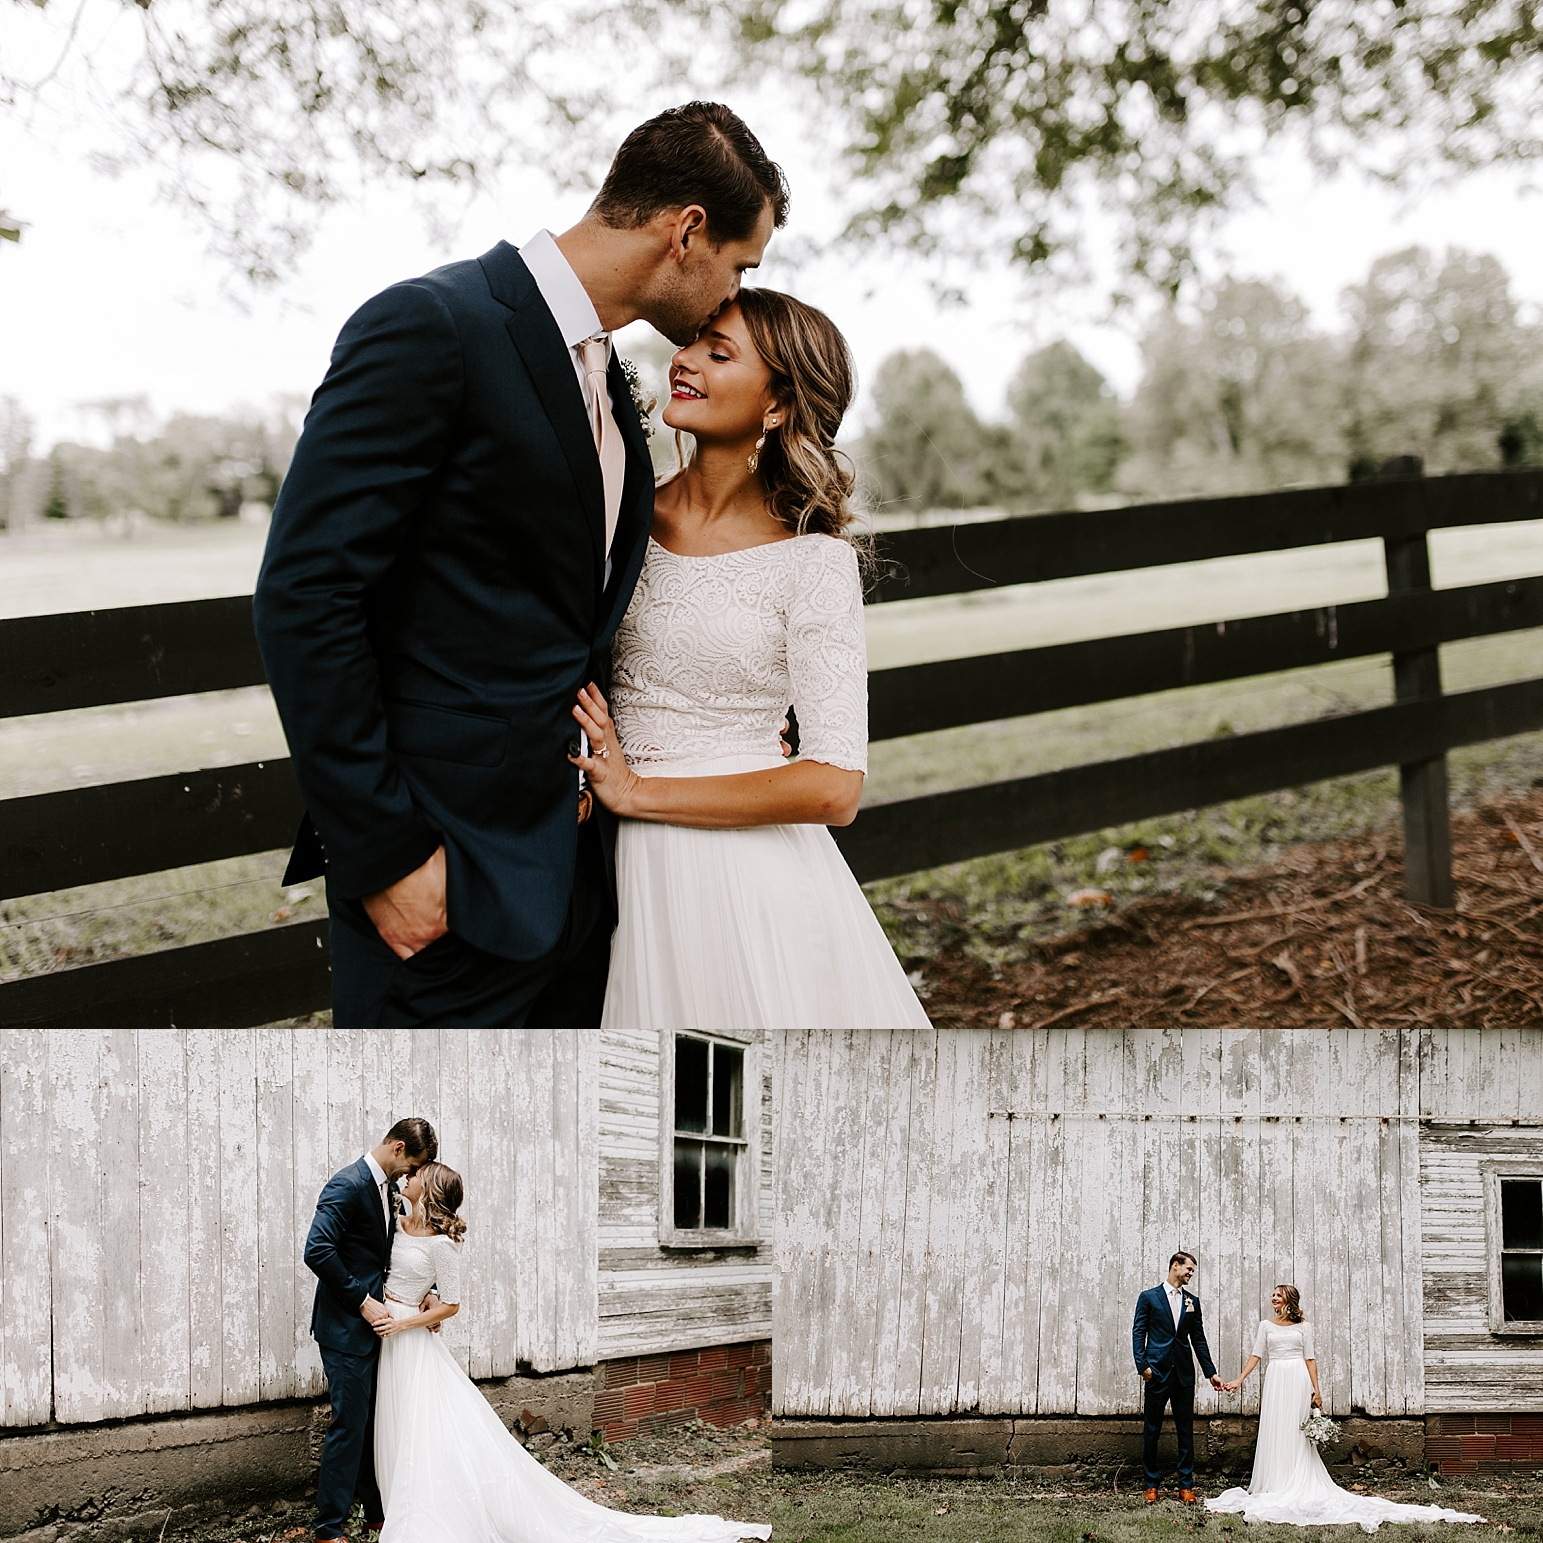 2018-09-23_0011ashley-sara-photography-pittsburgh-photographer-wedding-photographer-brookside-farm-wedding-louisville-ohio.jpg